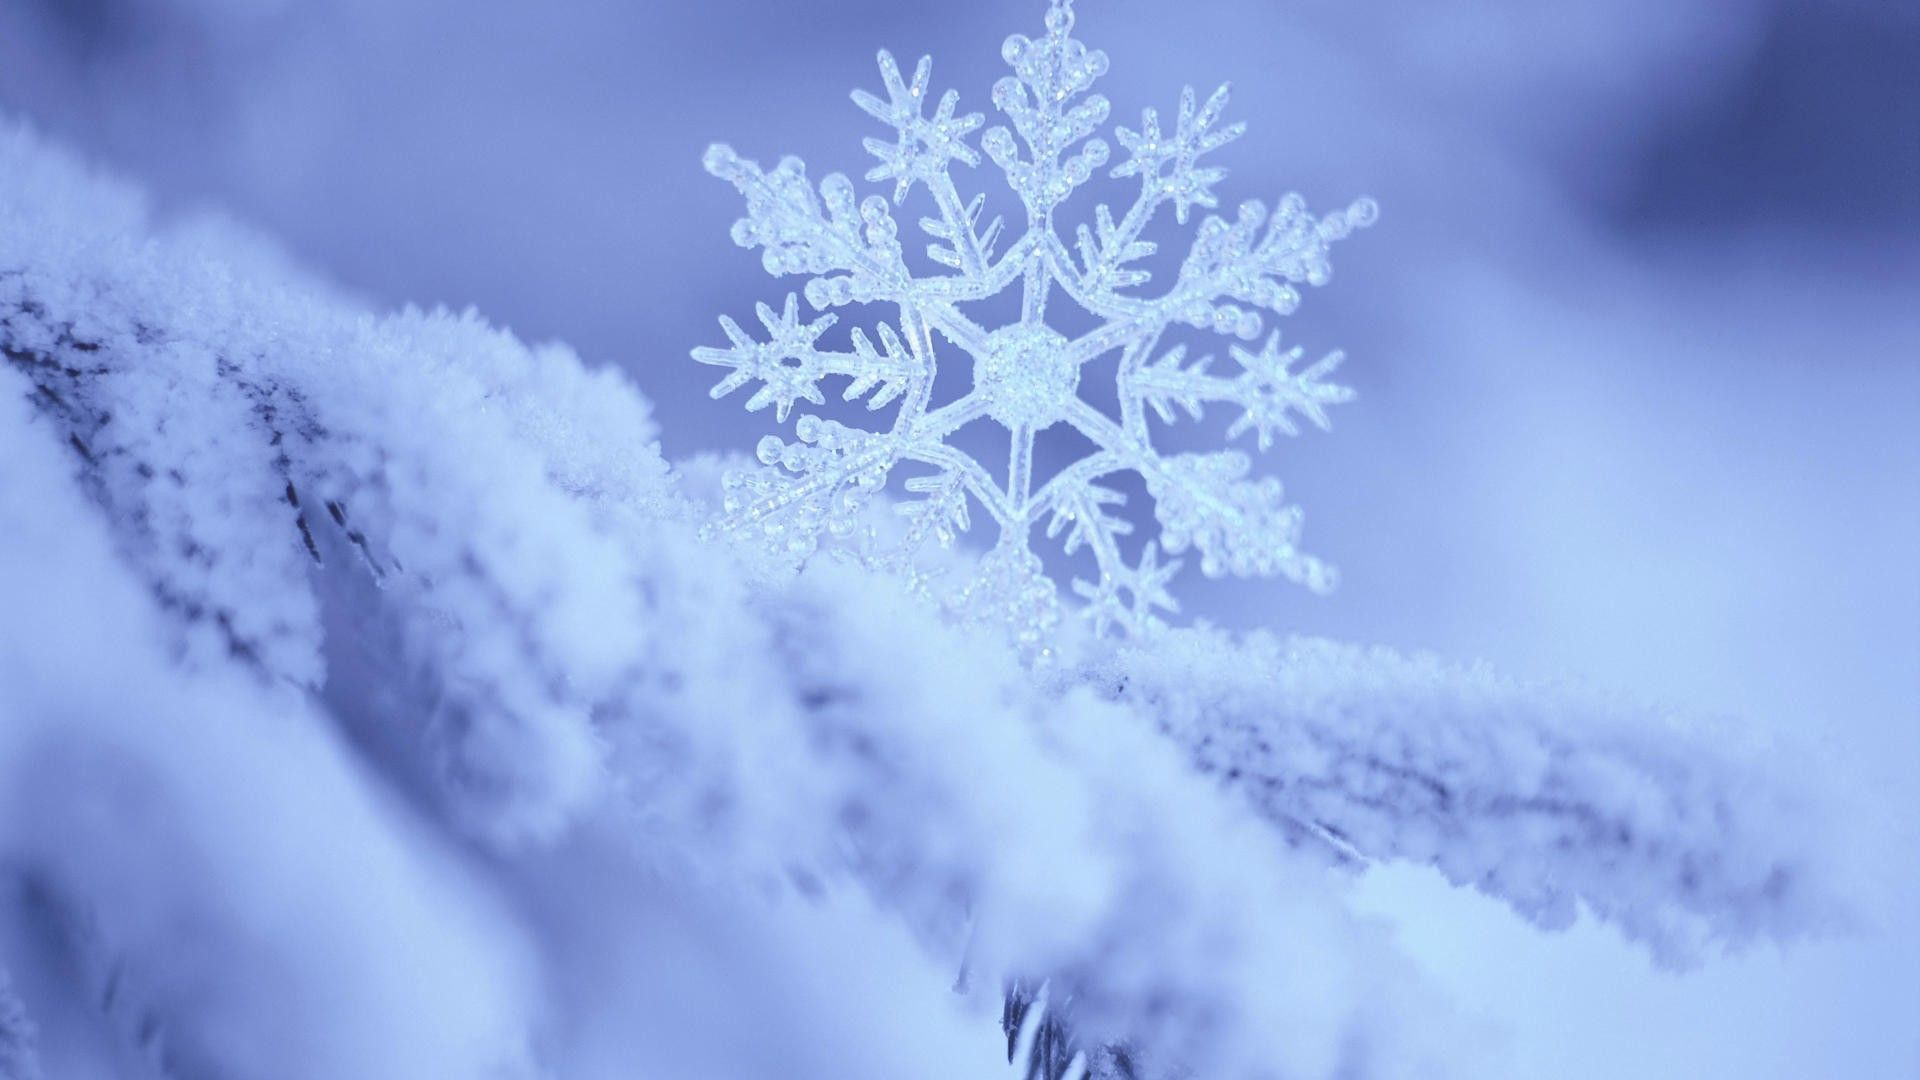 Snowflake wallpaper wallpapers backrounds pinterest snowflake wallpaper voltagebd Choice Image